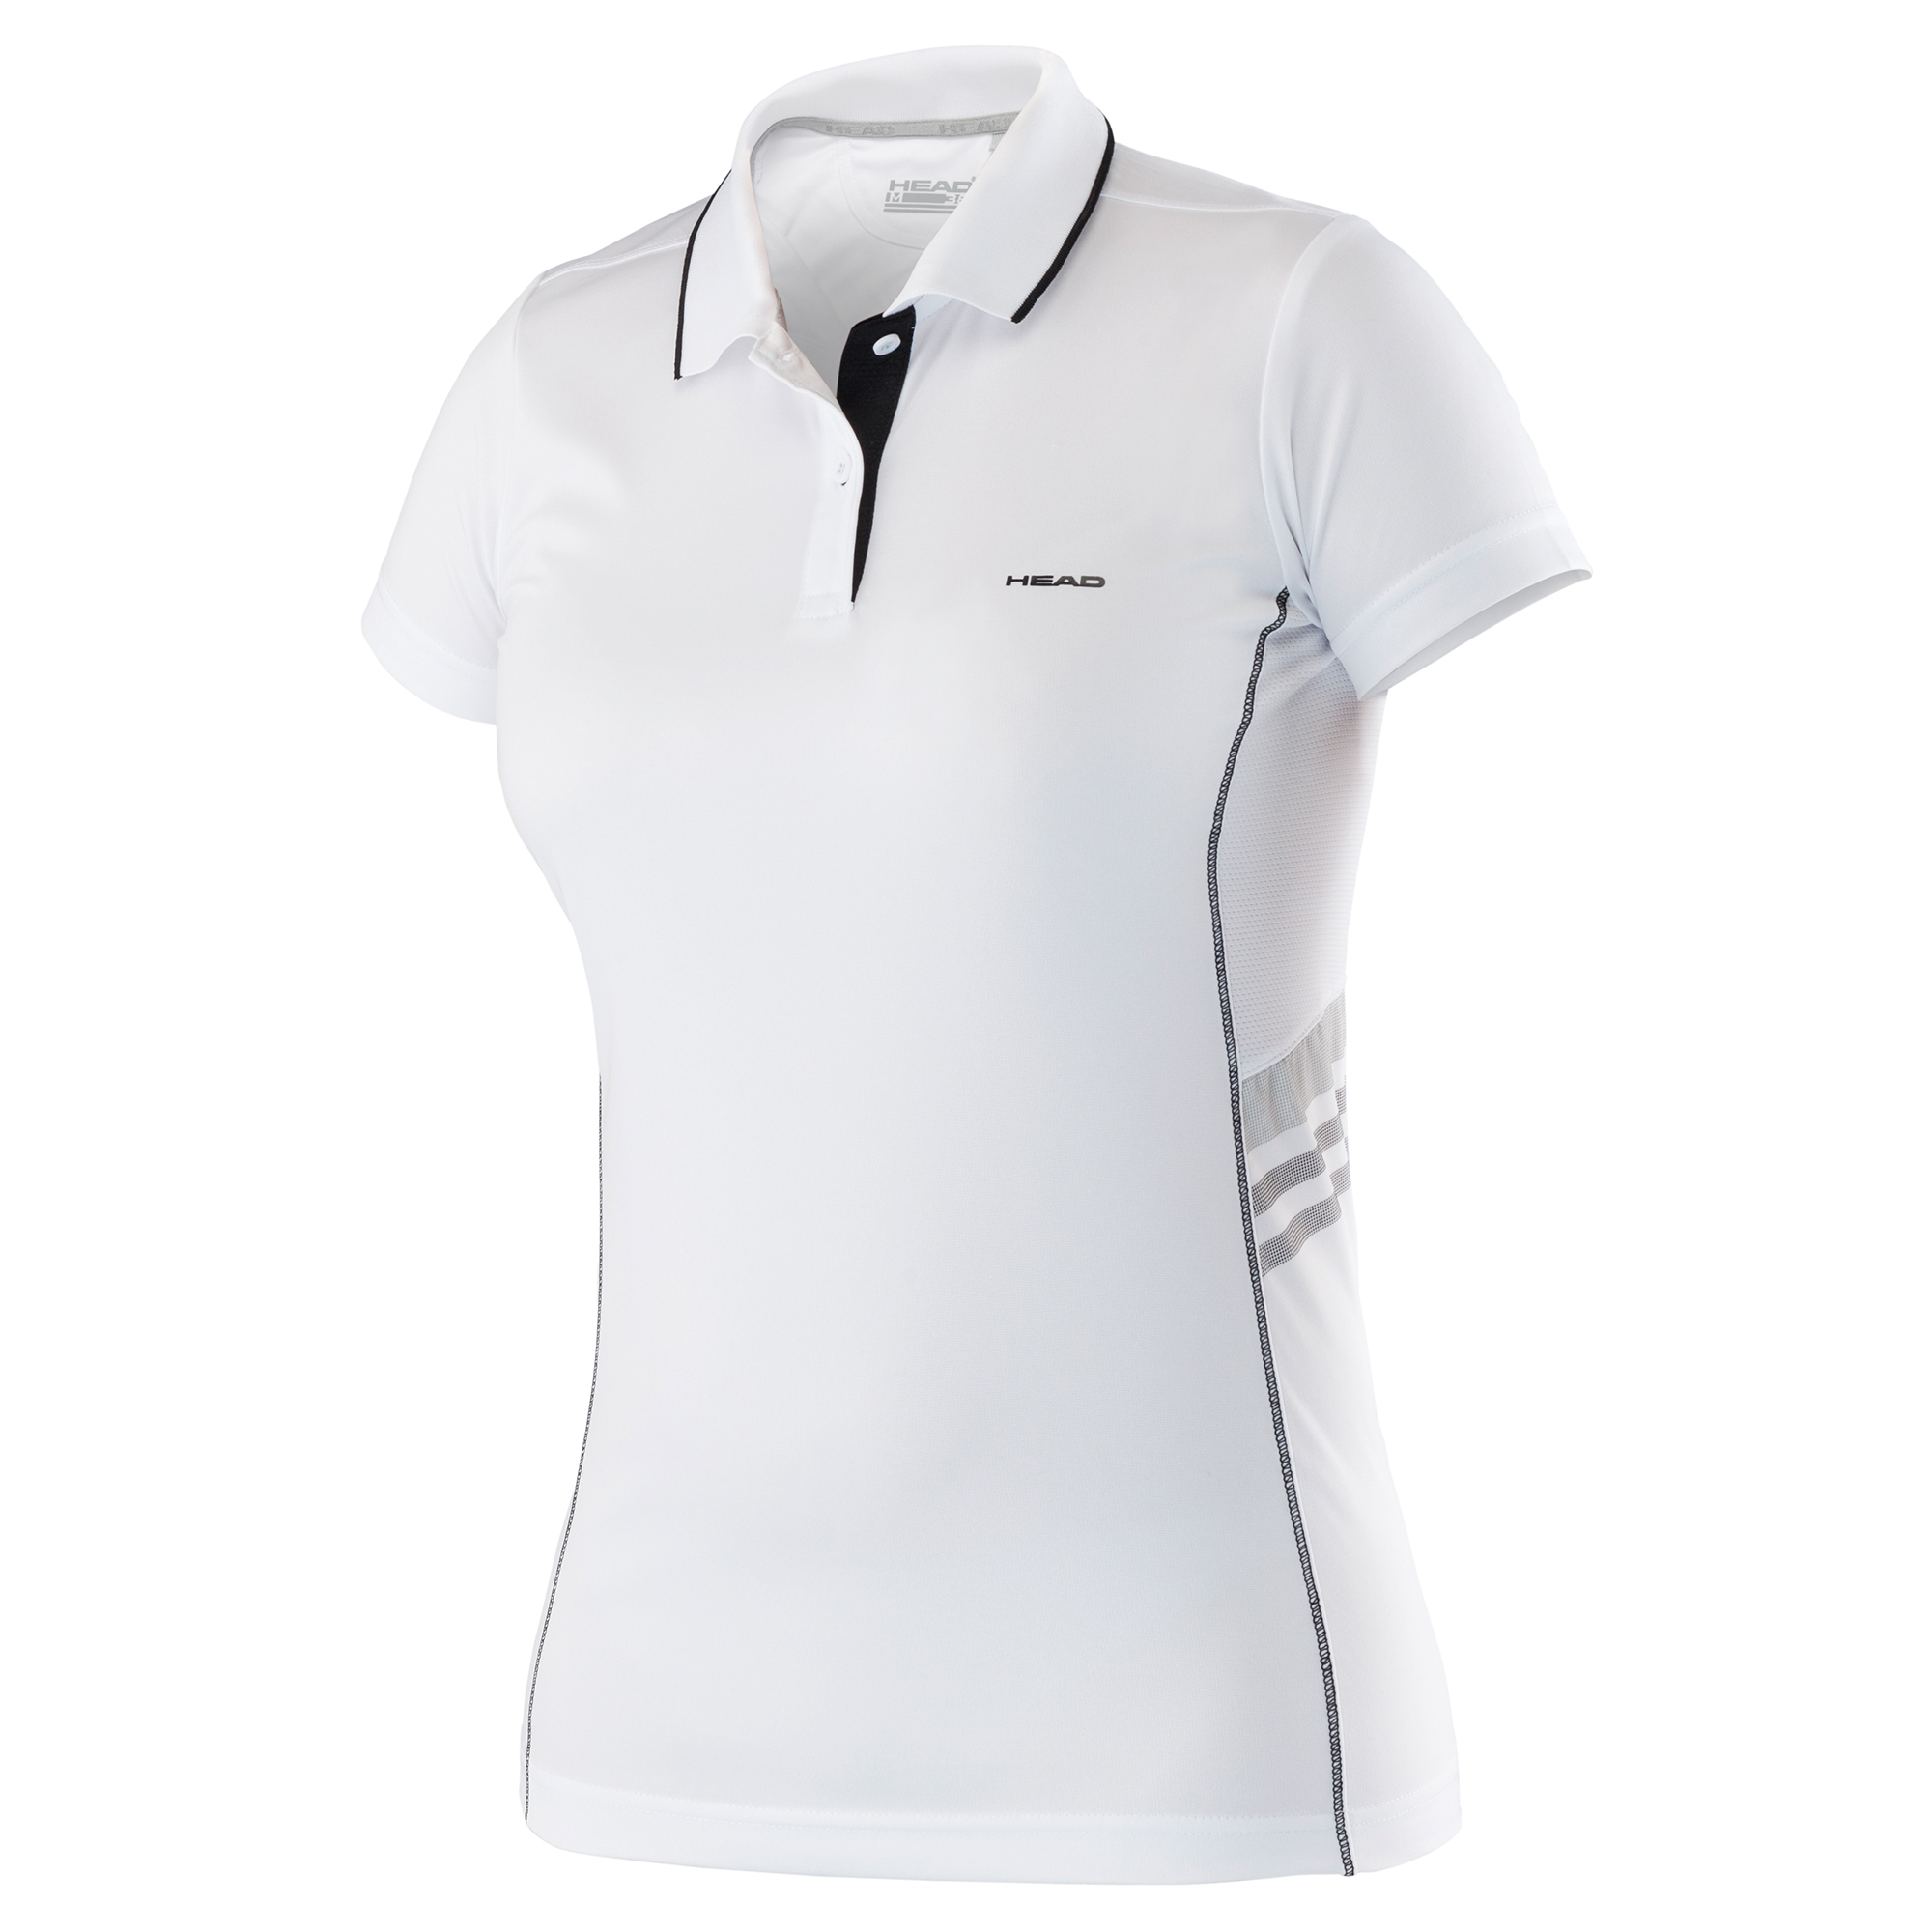 Head Club Technical Ladies Polo Shirt SS16 - White/Black, XS